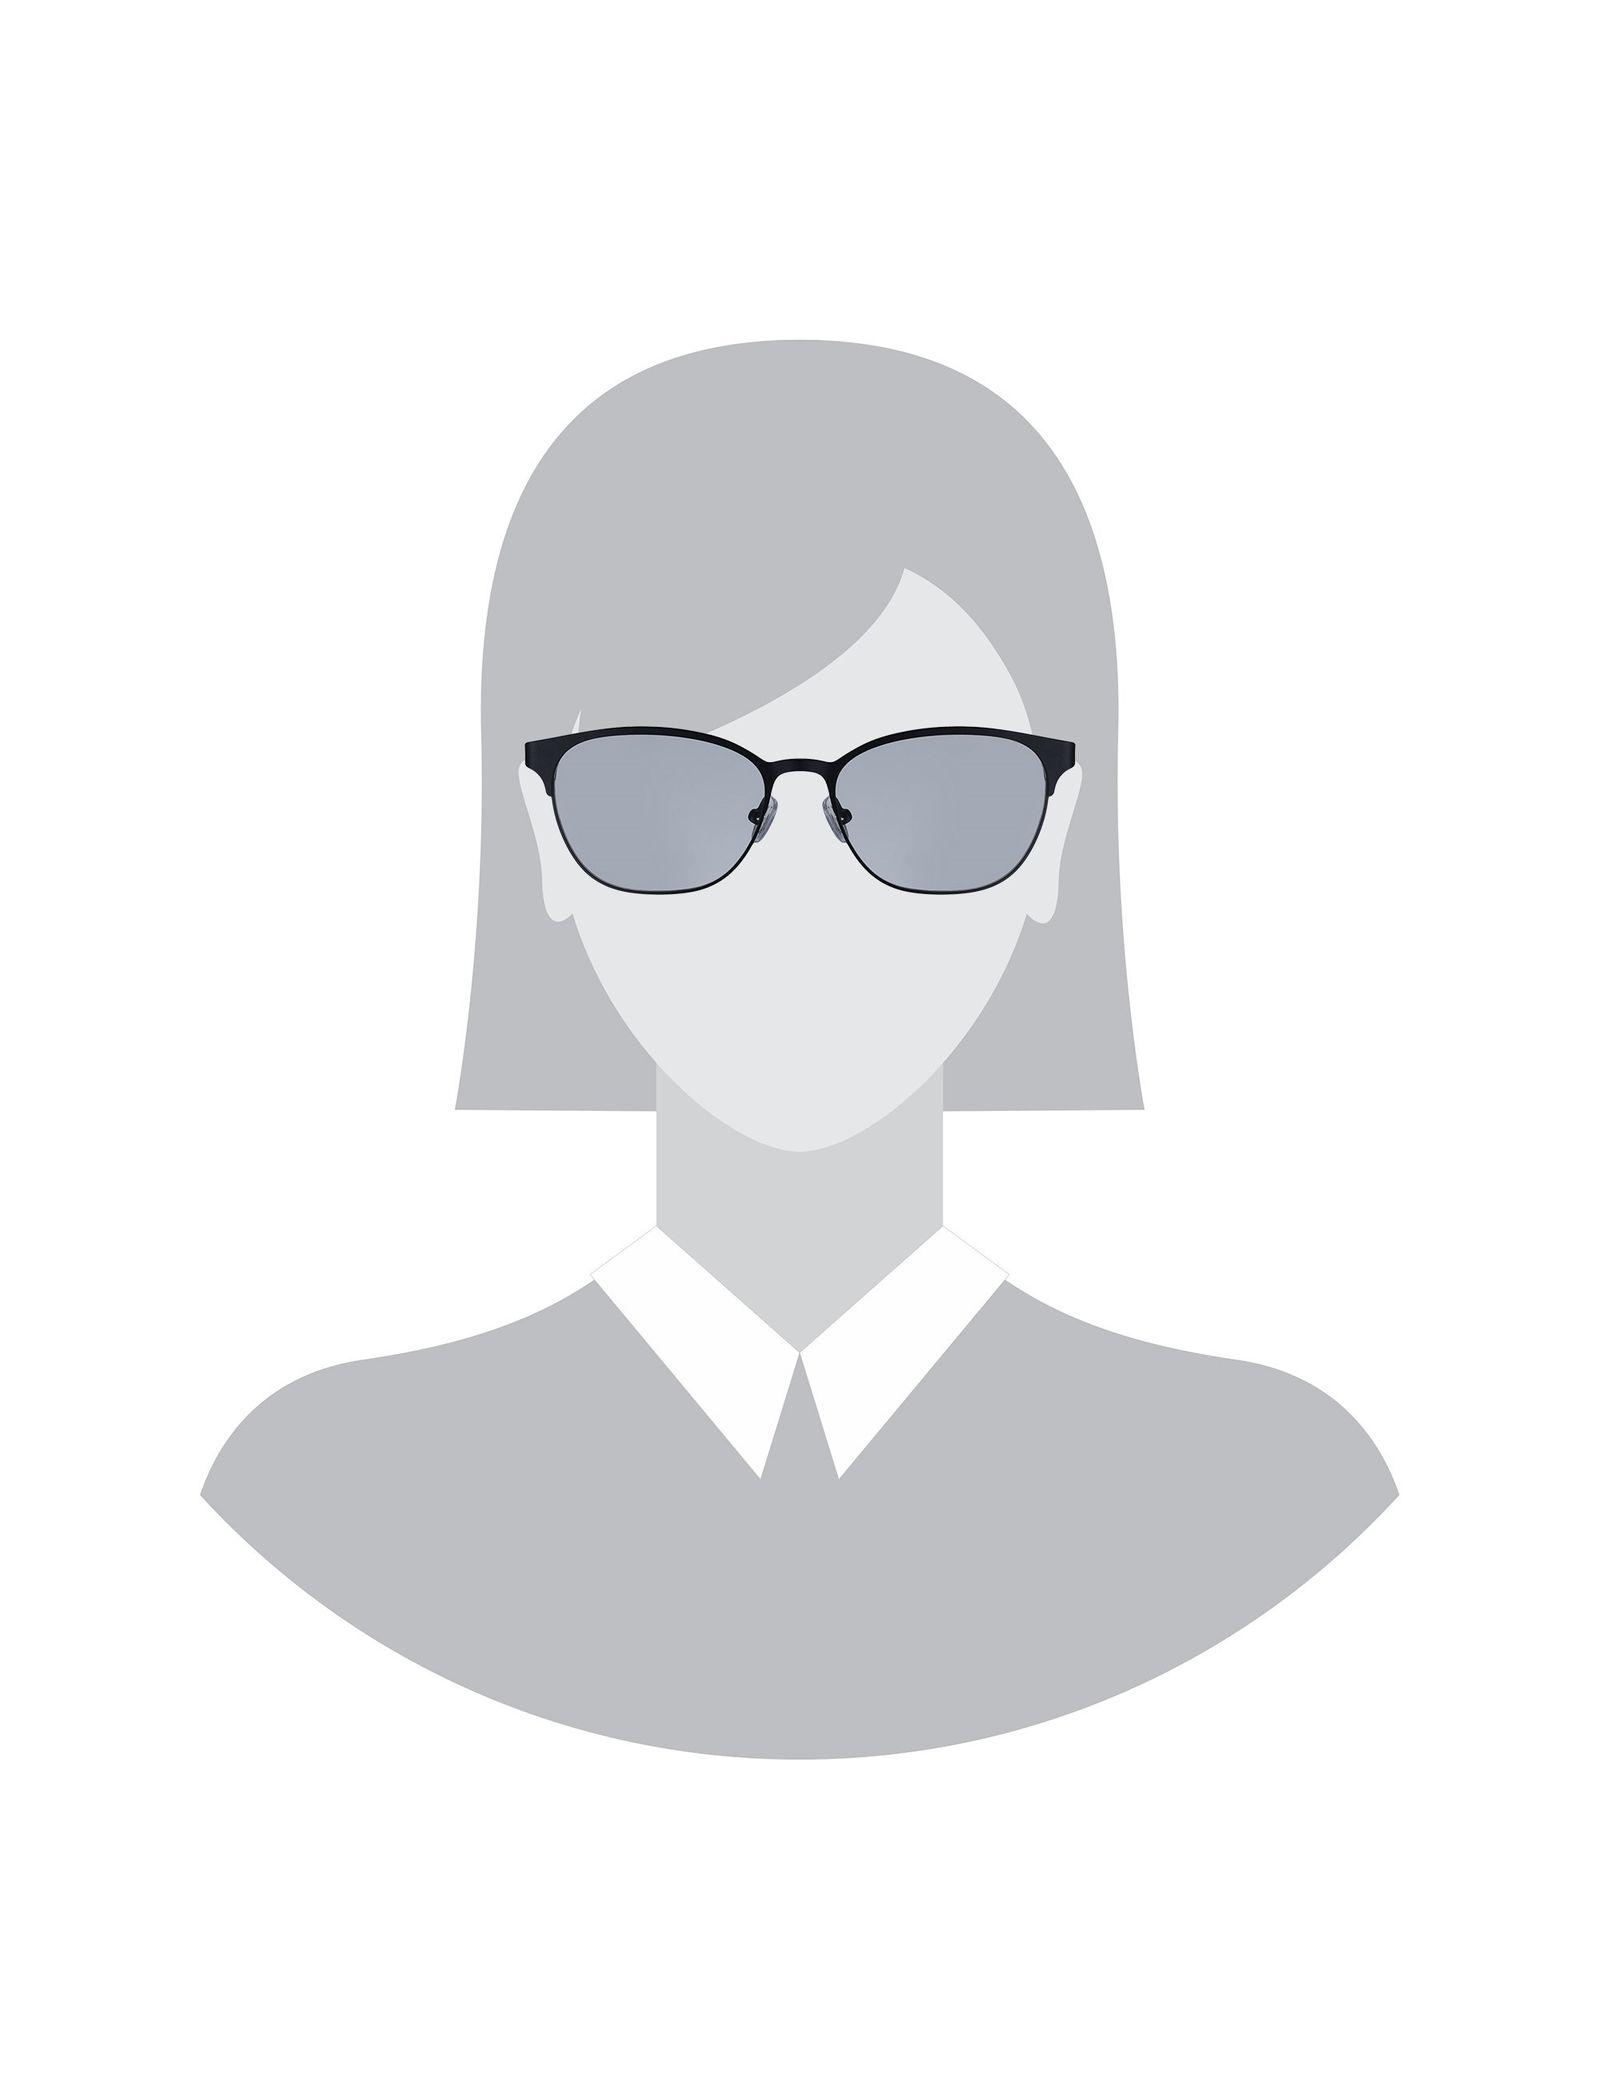 عینک طبی ویفرر زنانه - پپه جینز - مشکي - 5